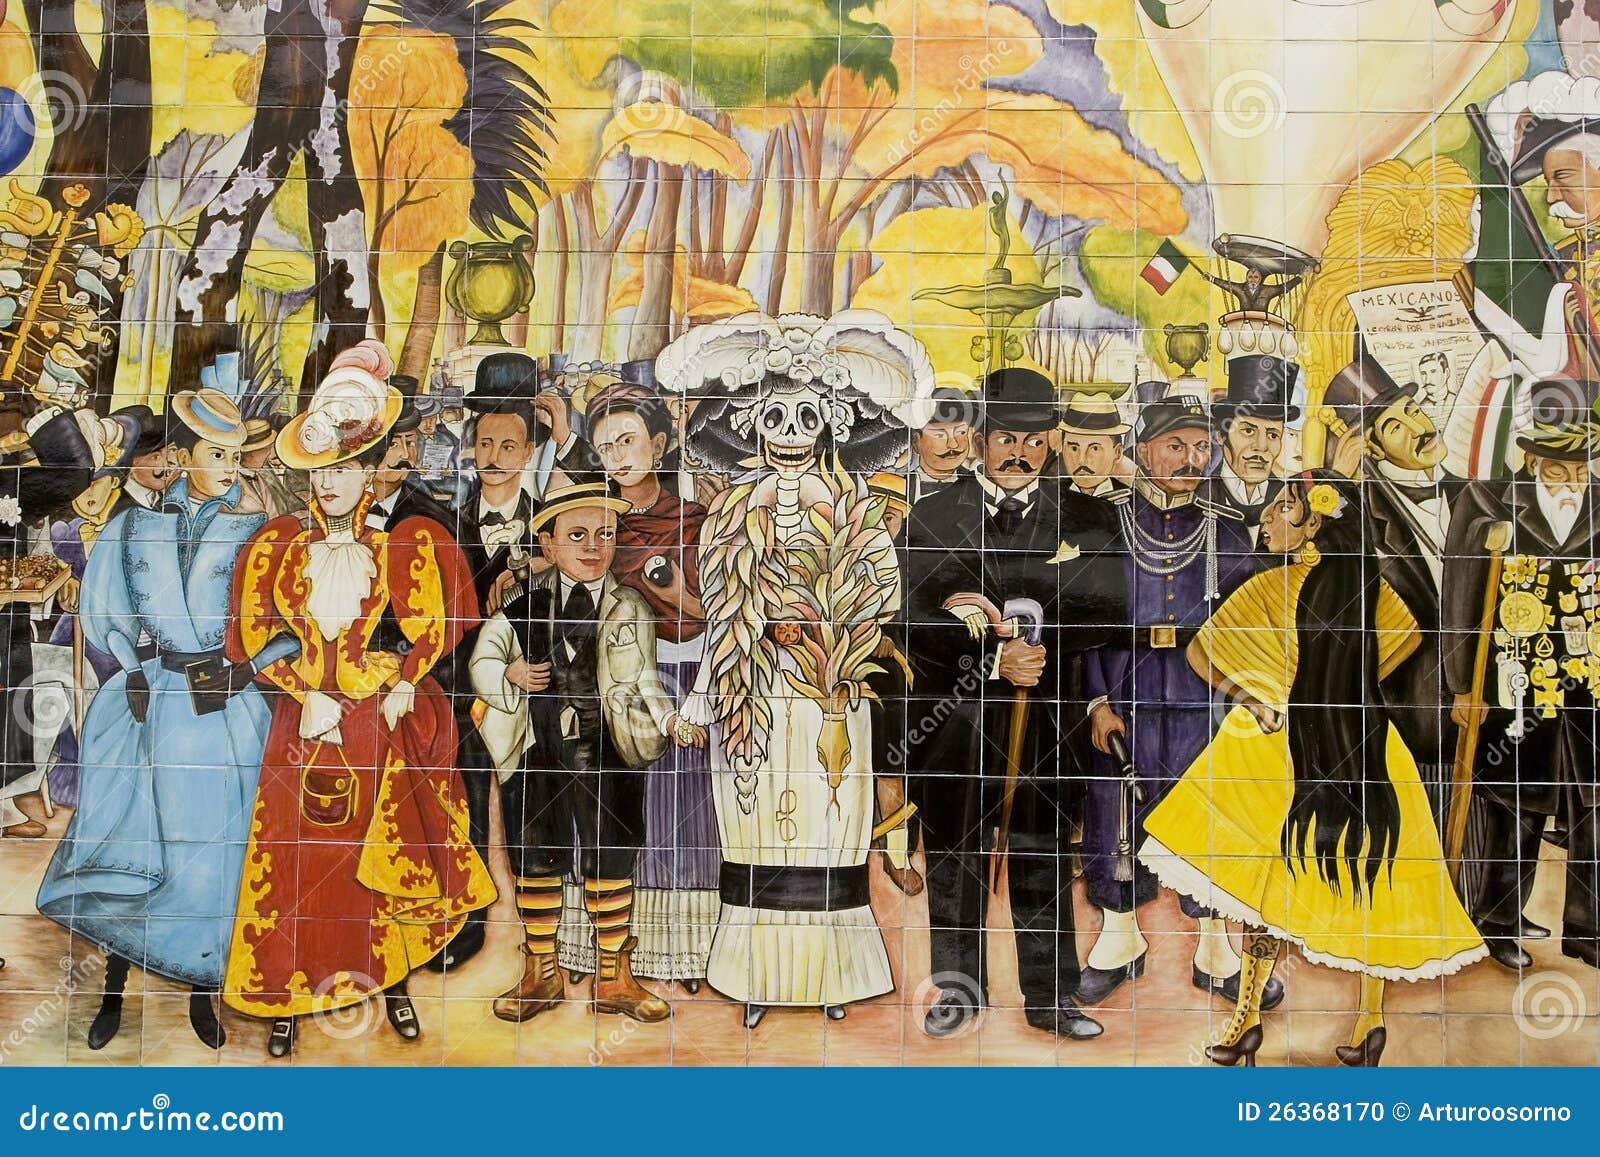 Mural de diego rivera imagen editorial imagen 26368170 for Mural de rivera